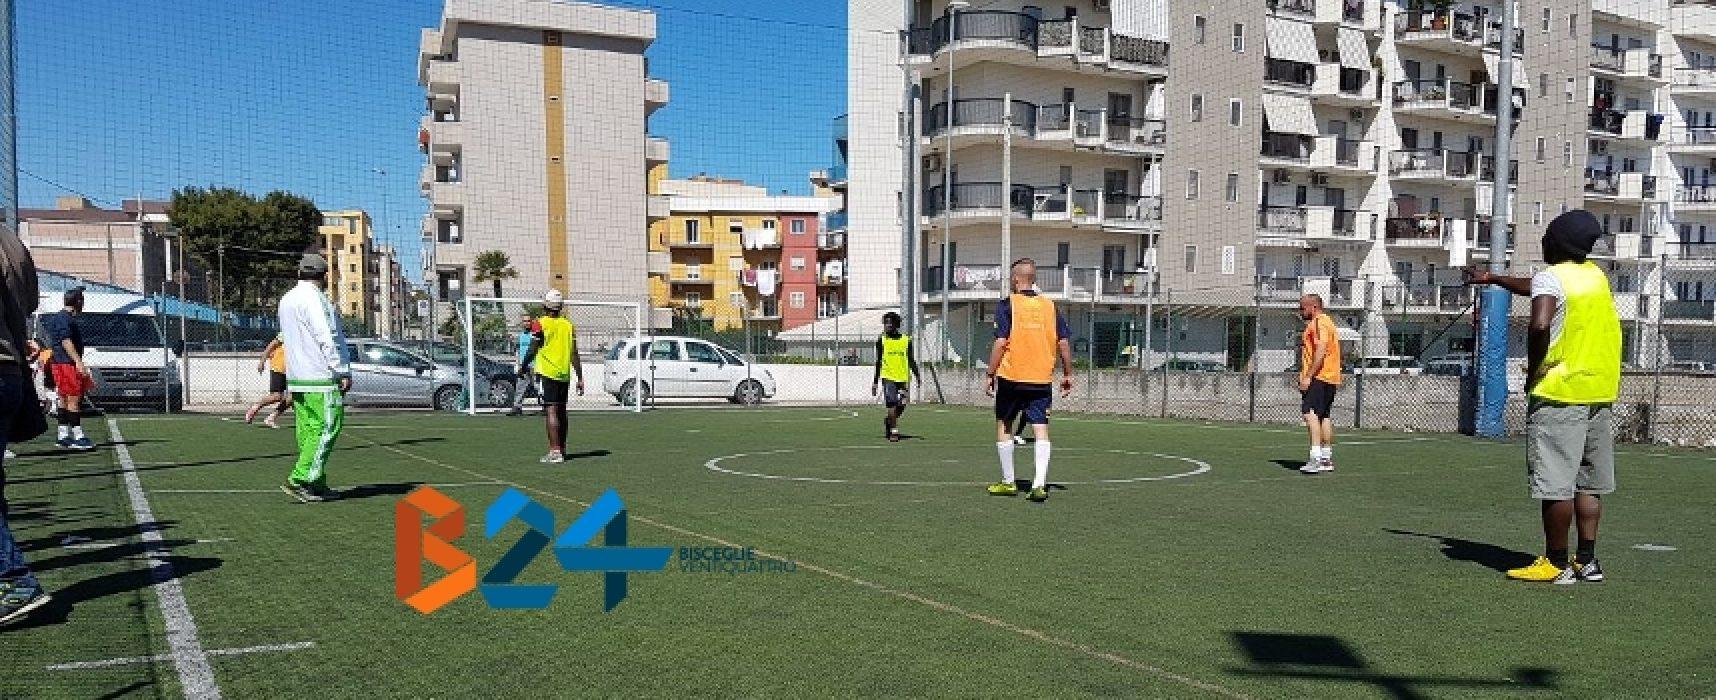 Torneo multiculturale di calcio a 5, una vittoria per l'integrazione sociale / VIDEO